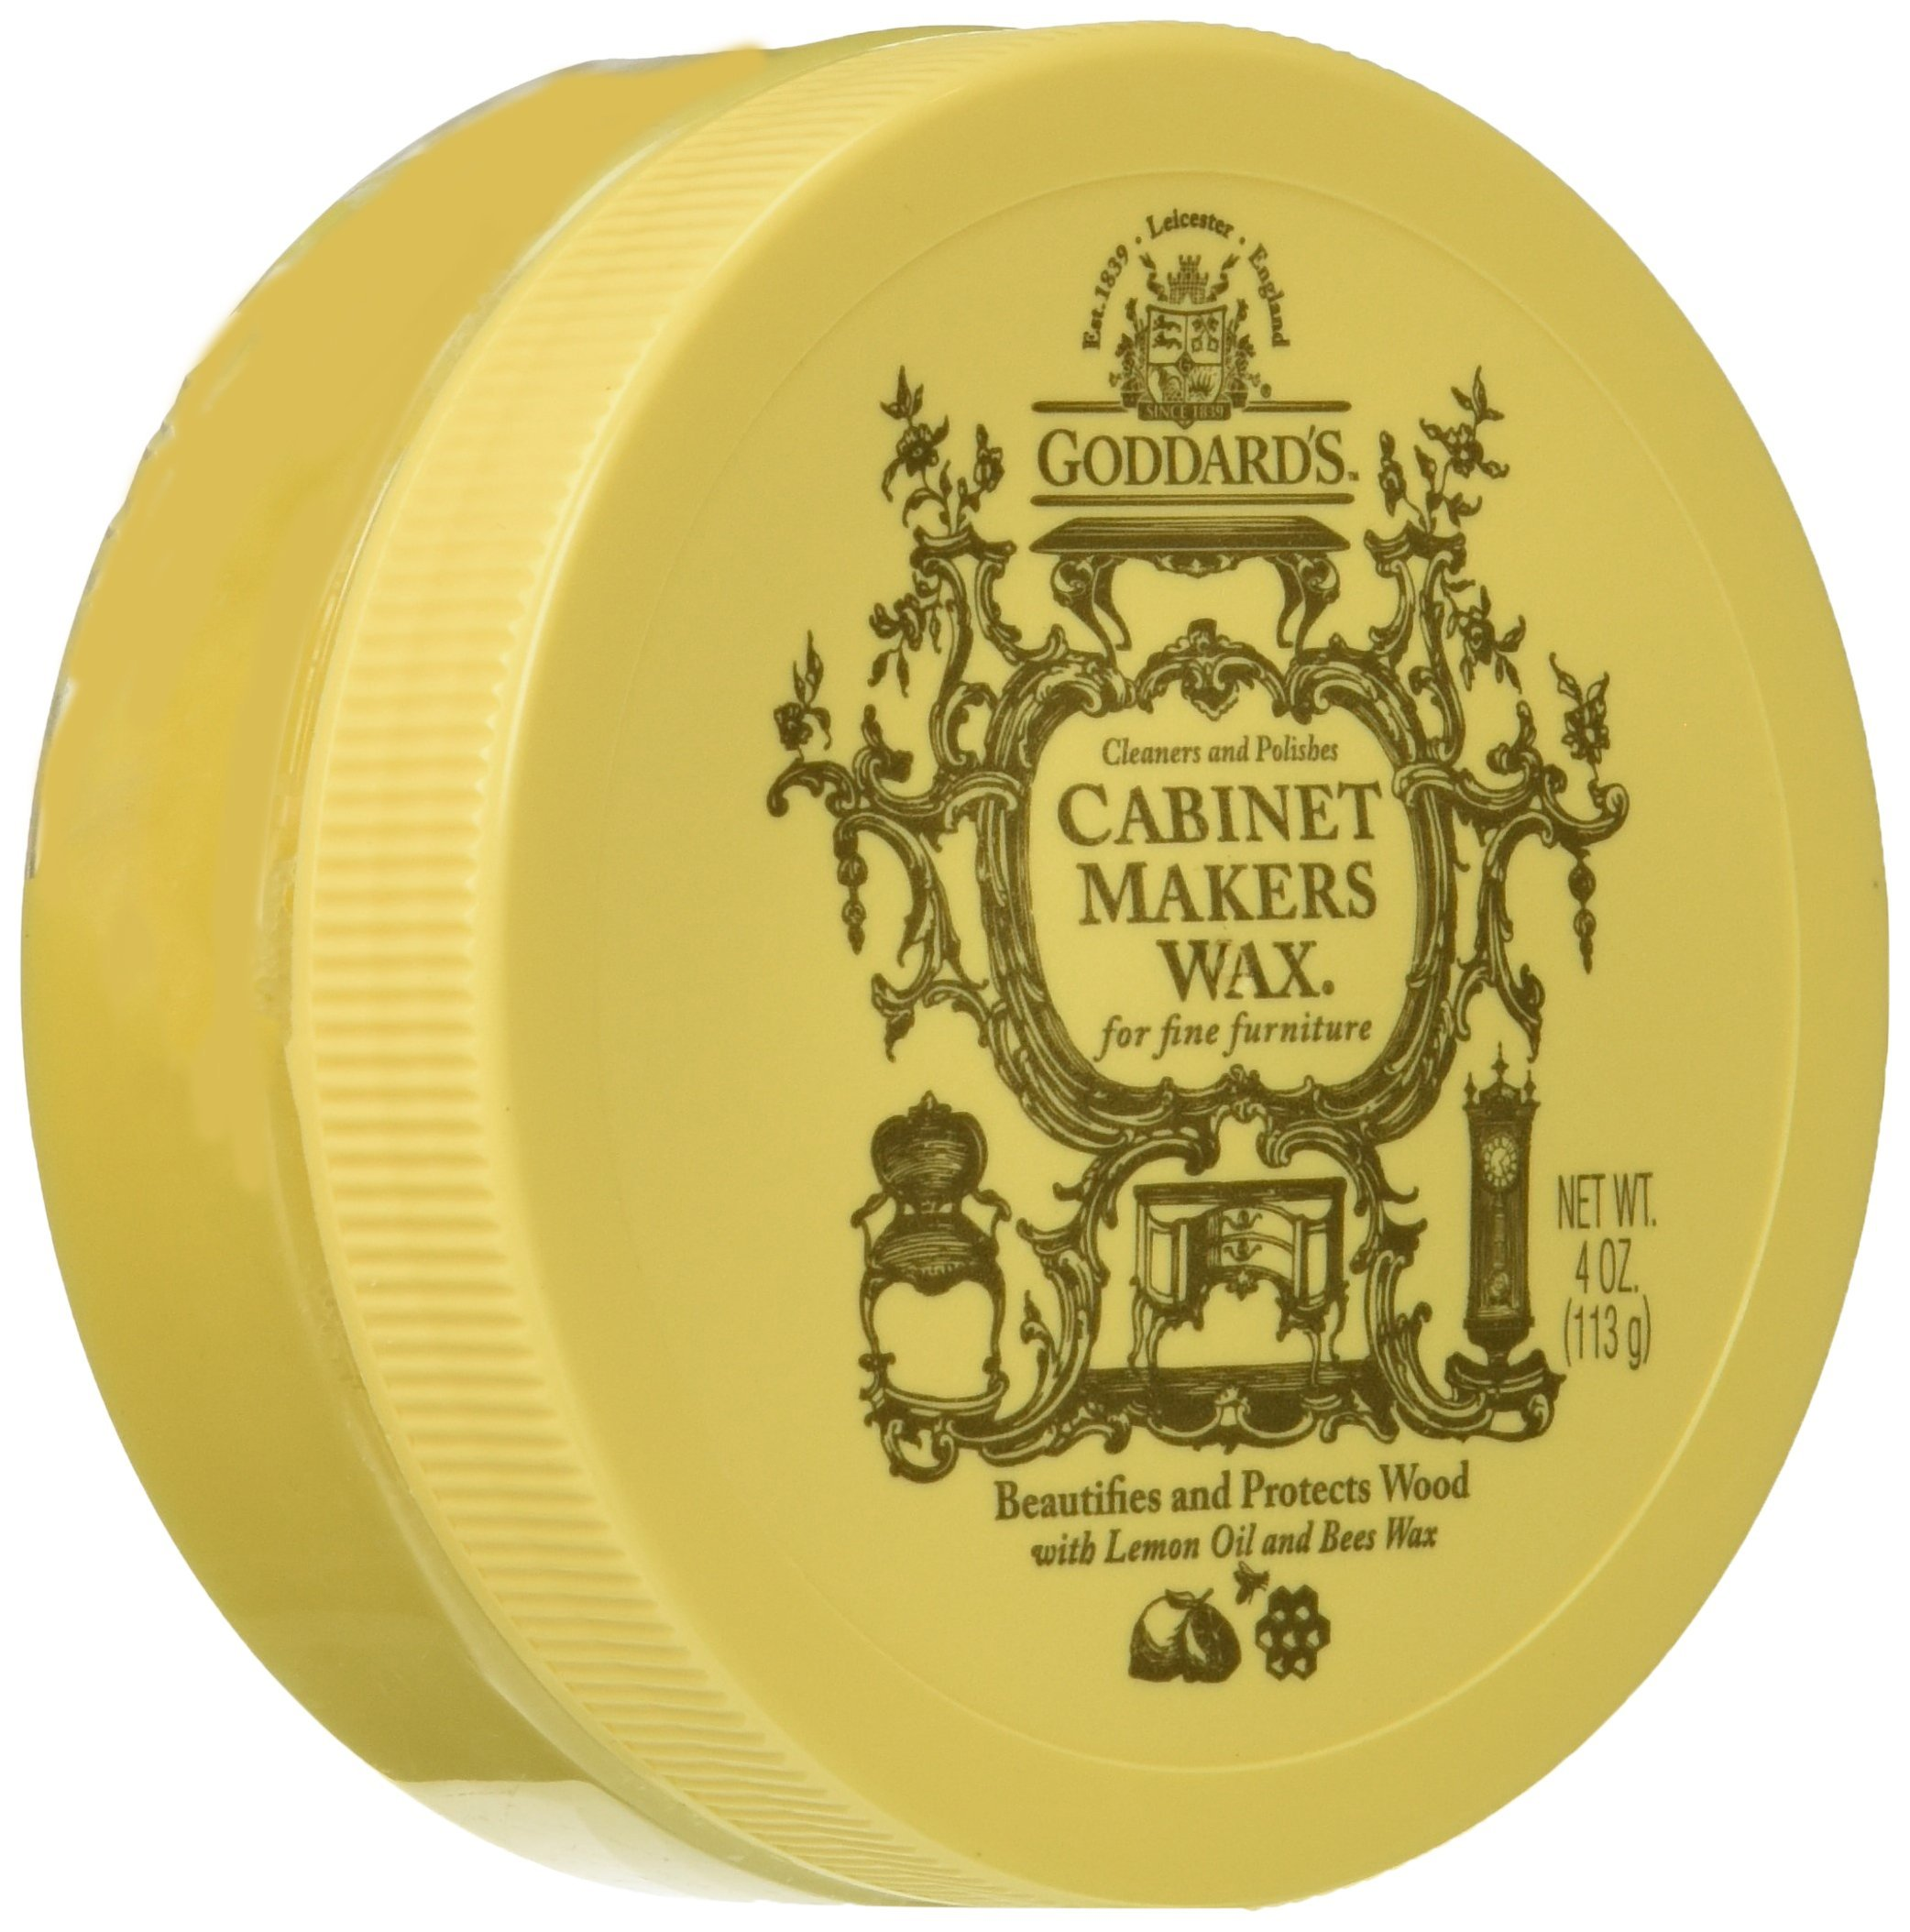 Goddards Cabinet Makers Paste Wax, 4 oz